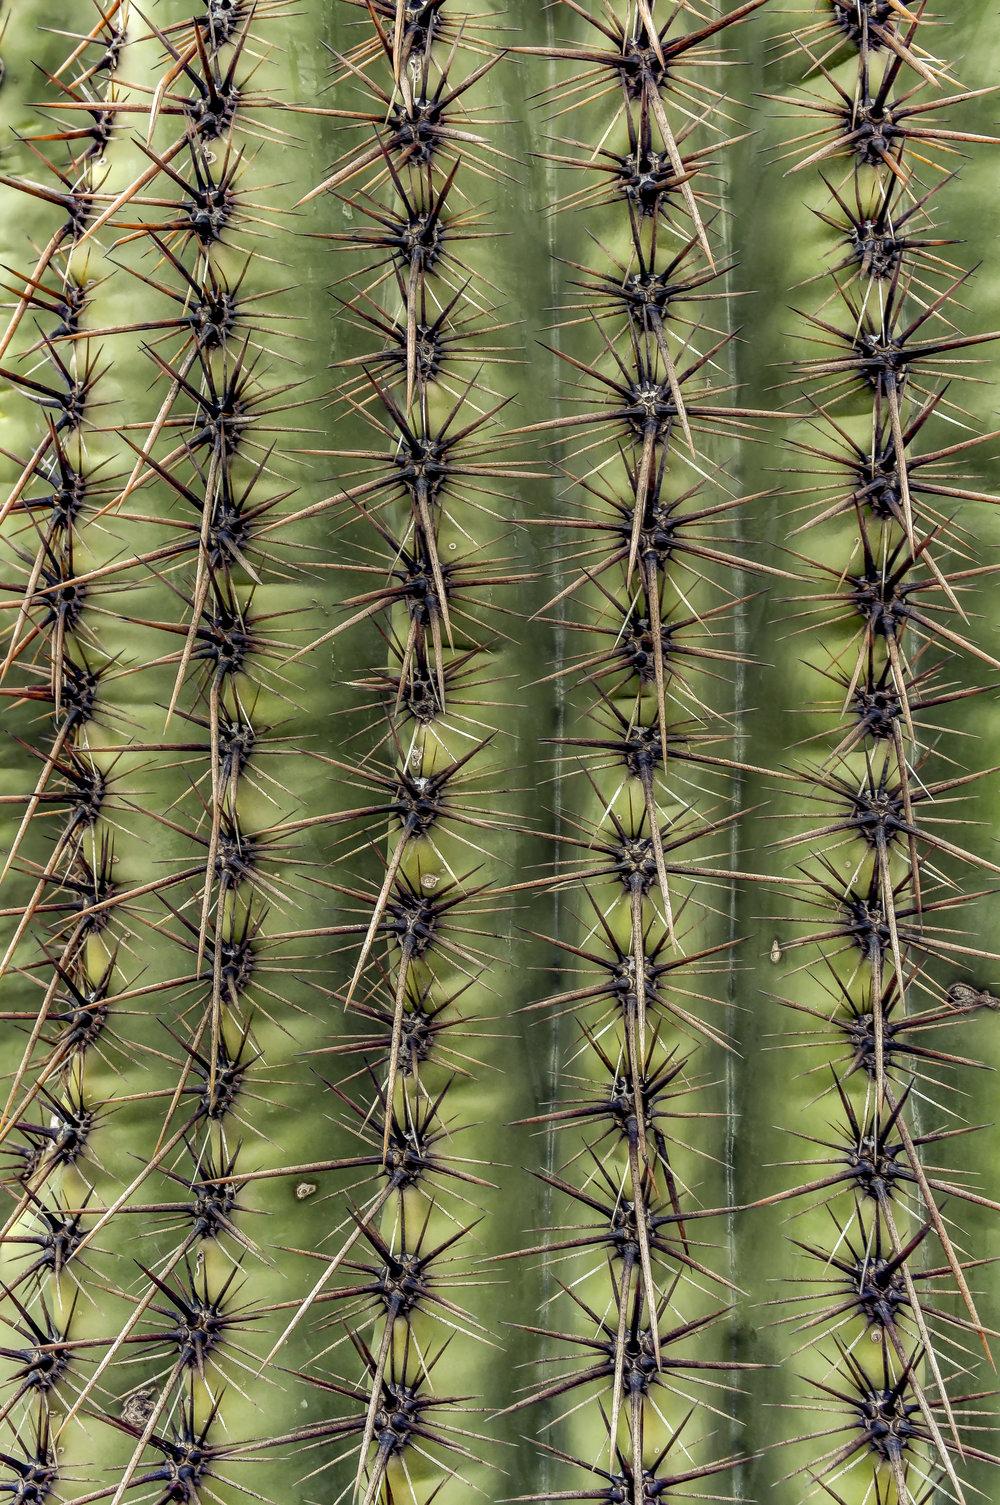 Saguaro_10.jpg